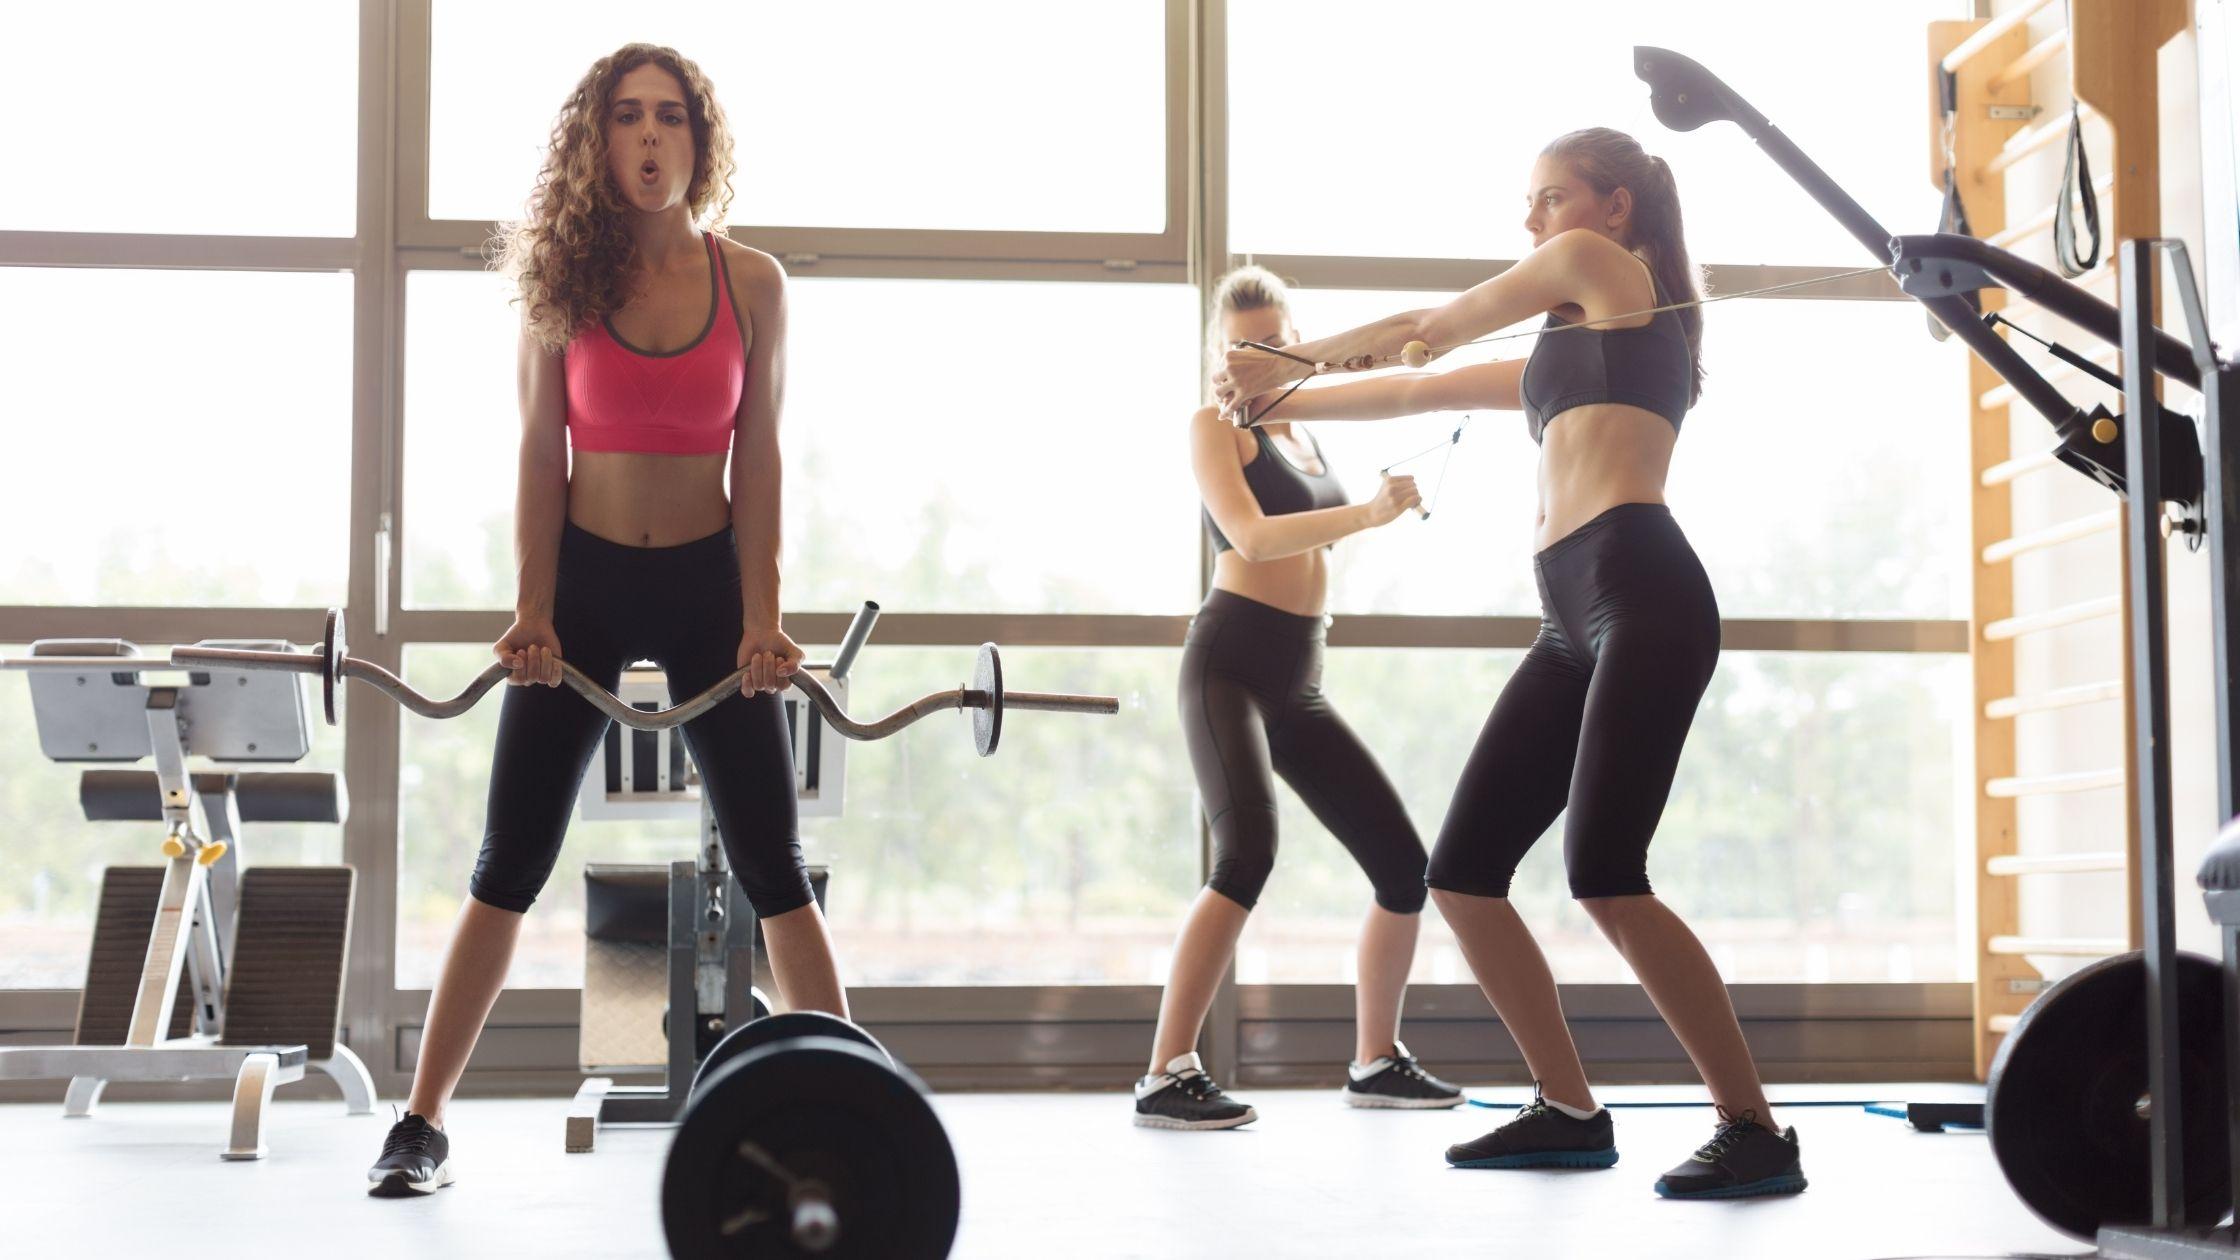 types of gyms: women gym